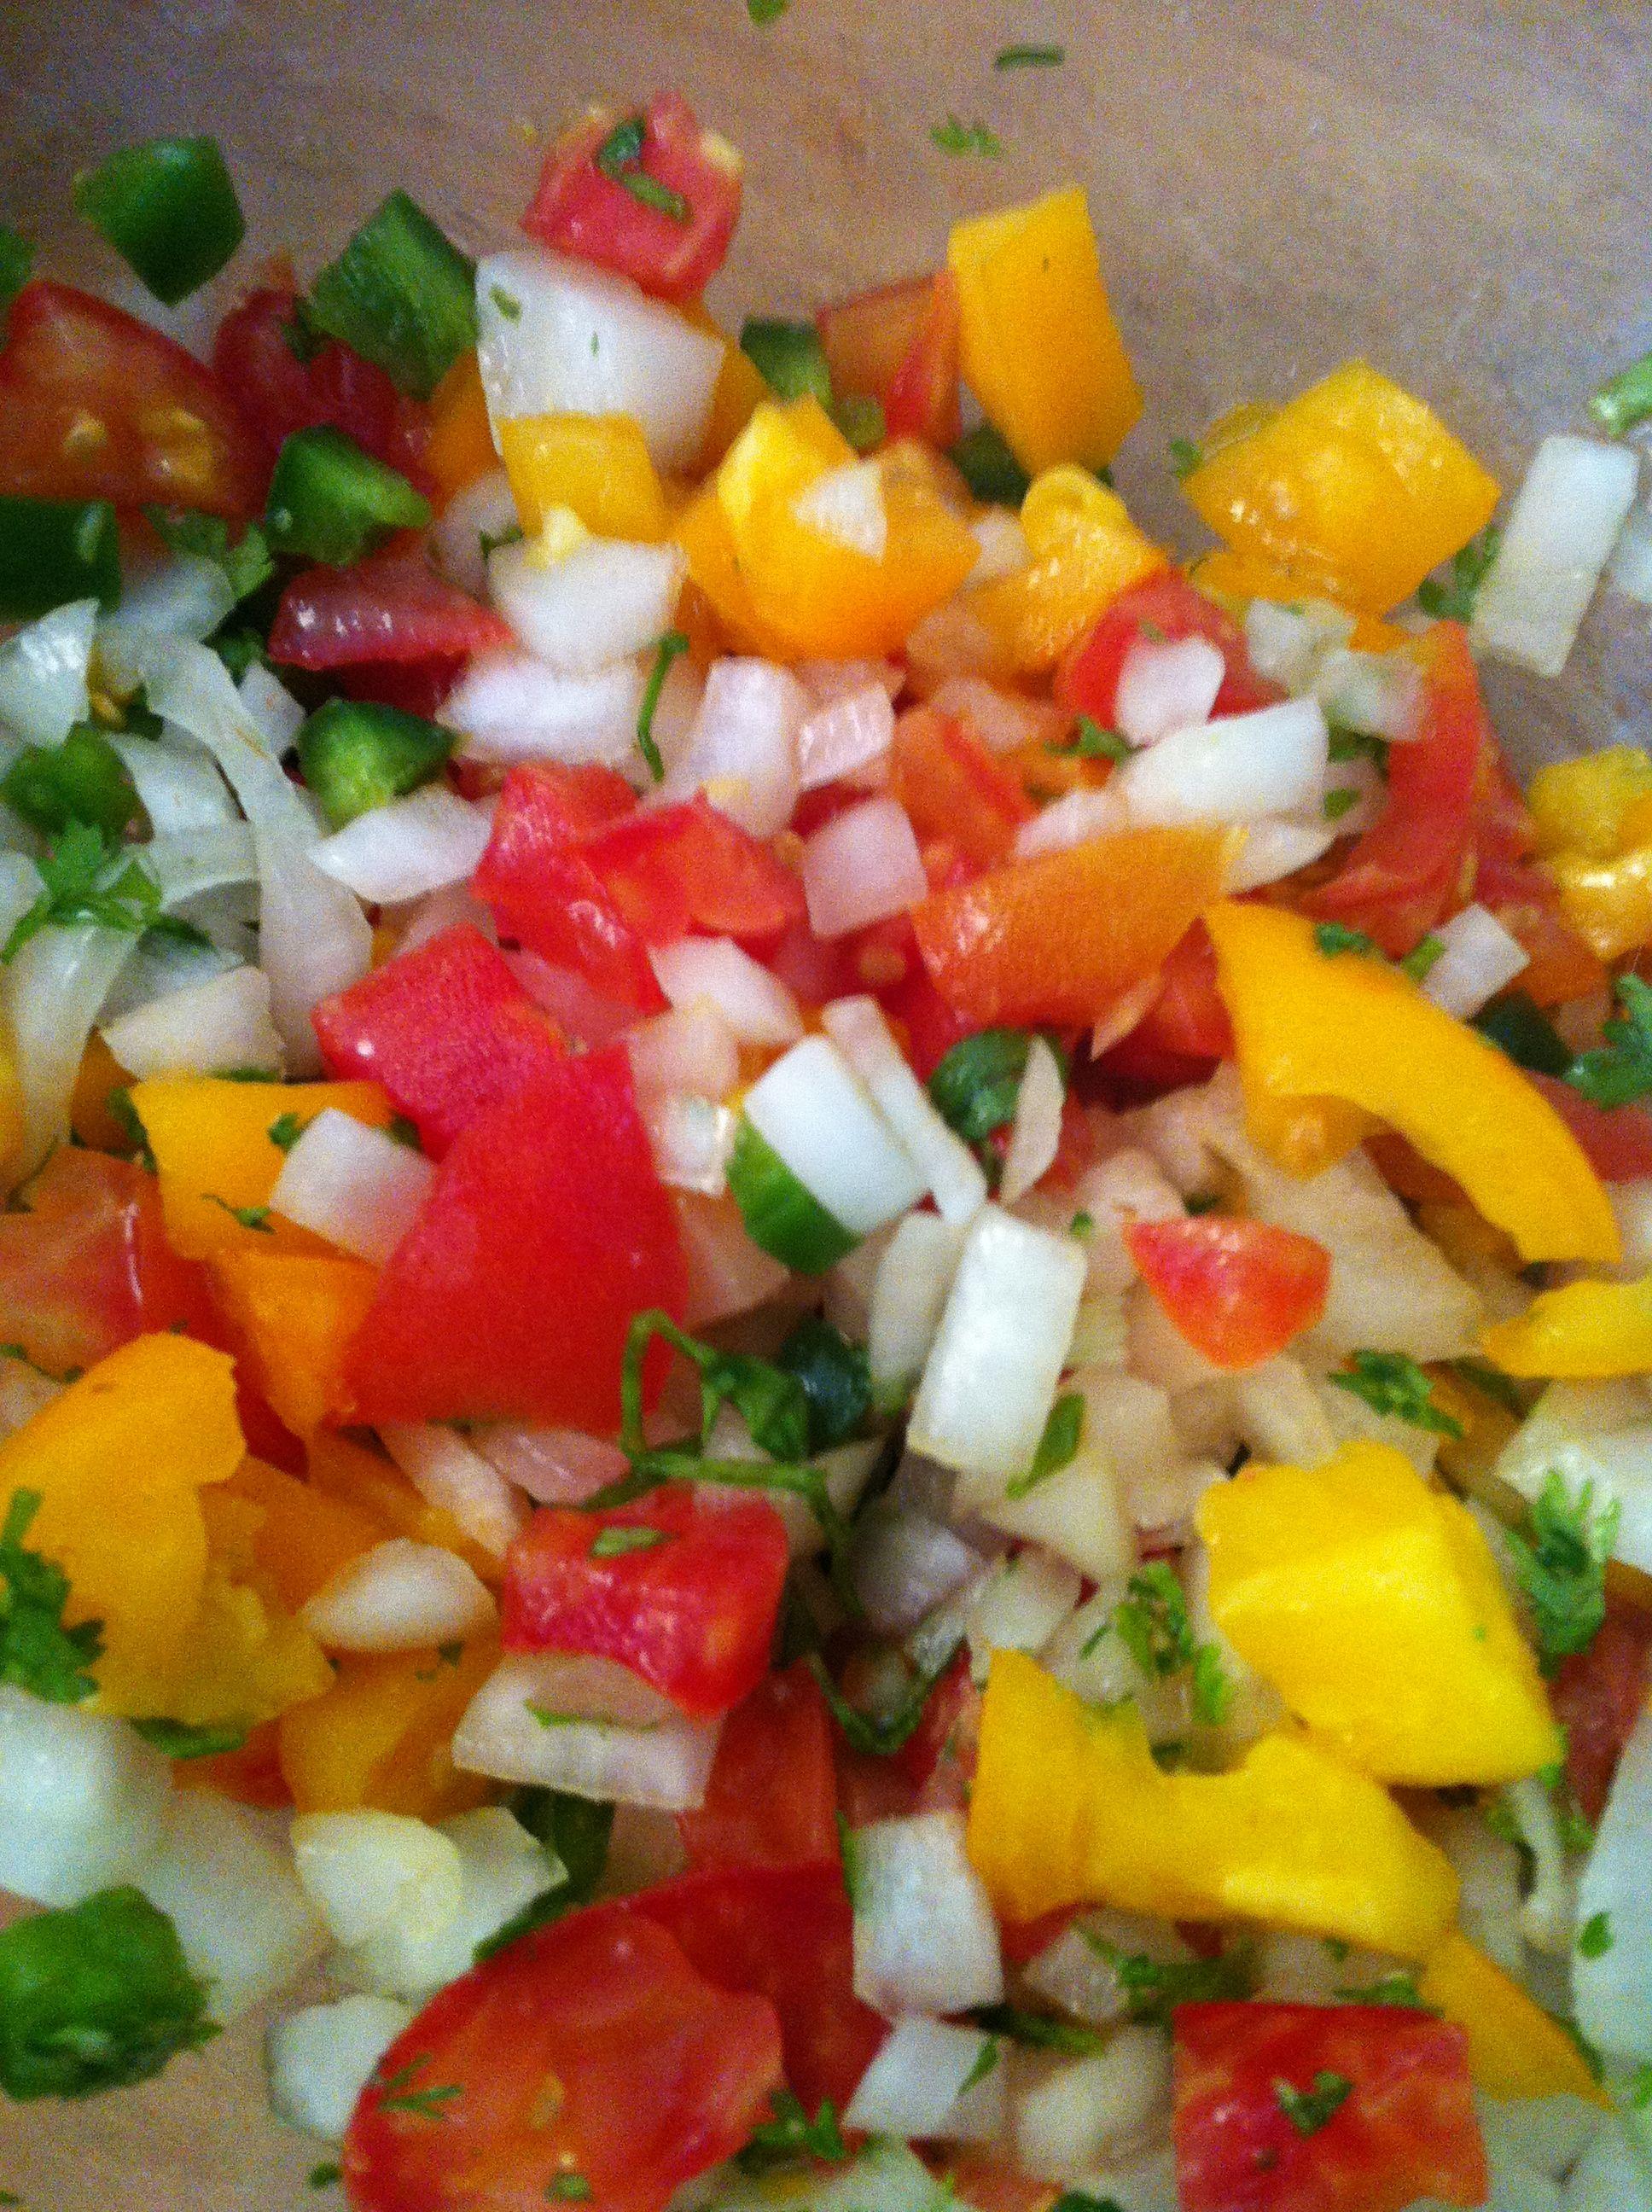 Heirloom tomato pico de gallo.  Combine two tomatoes, chopped, 1/2 onion, diced, 1/2 jalapeño, minced, handful cilantro, chopped, 1/2 lemon squeezed onto above, salt to taste. Mix together.